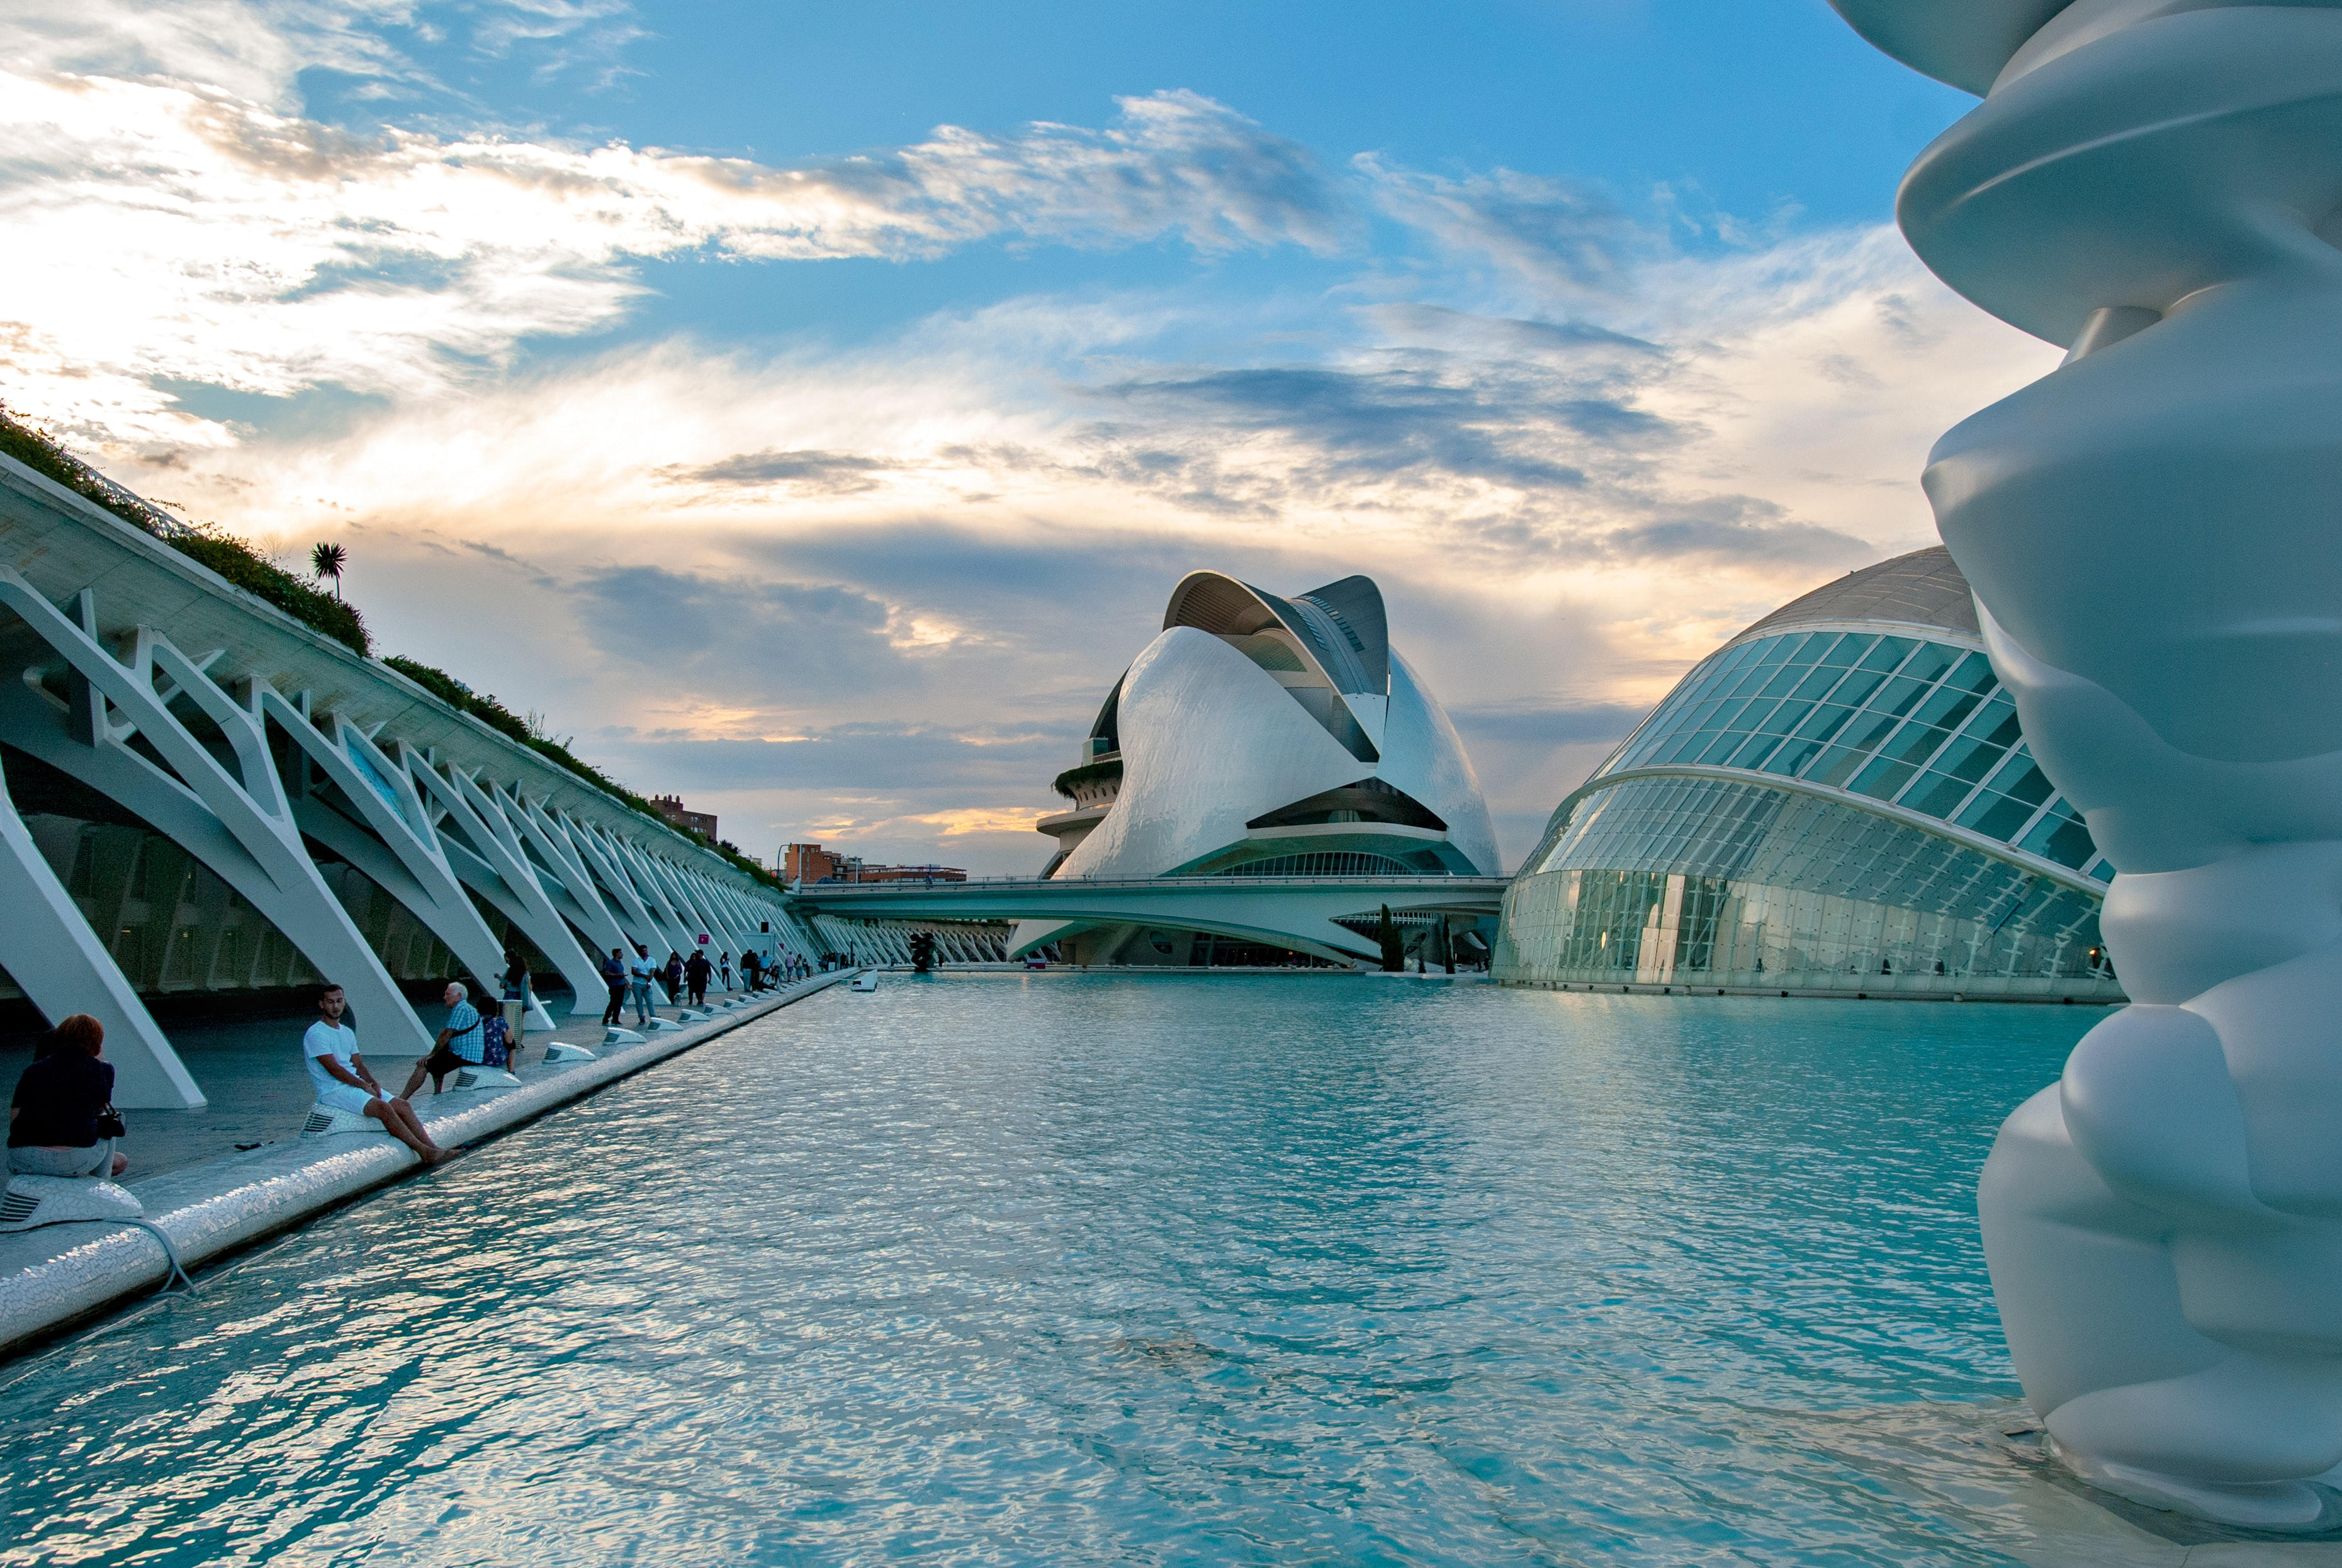 City of Arts and Science, Valencia, Spain, Art